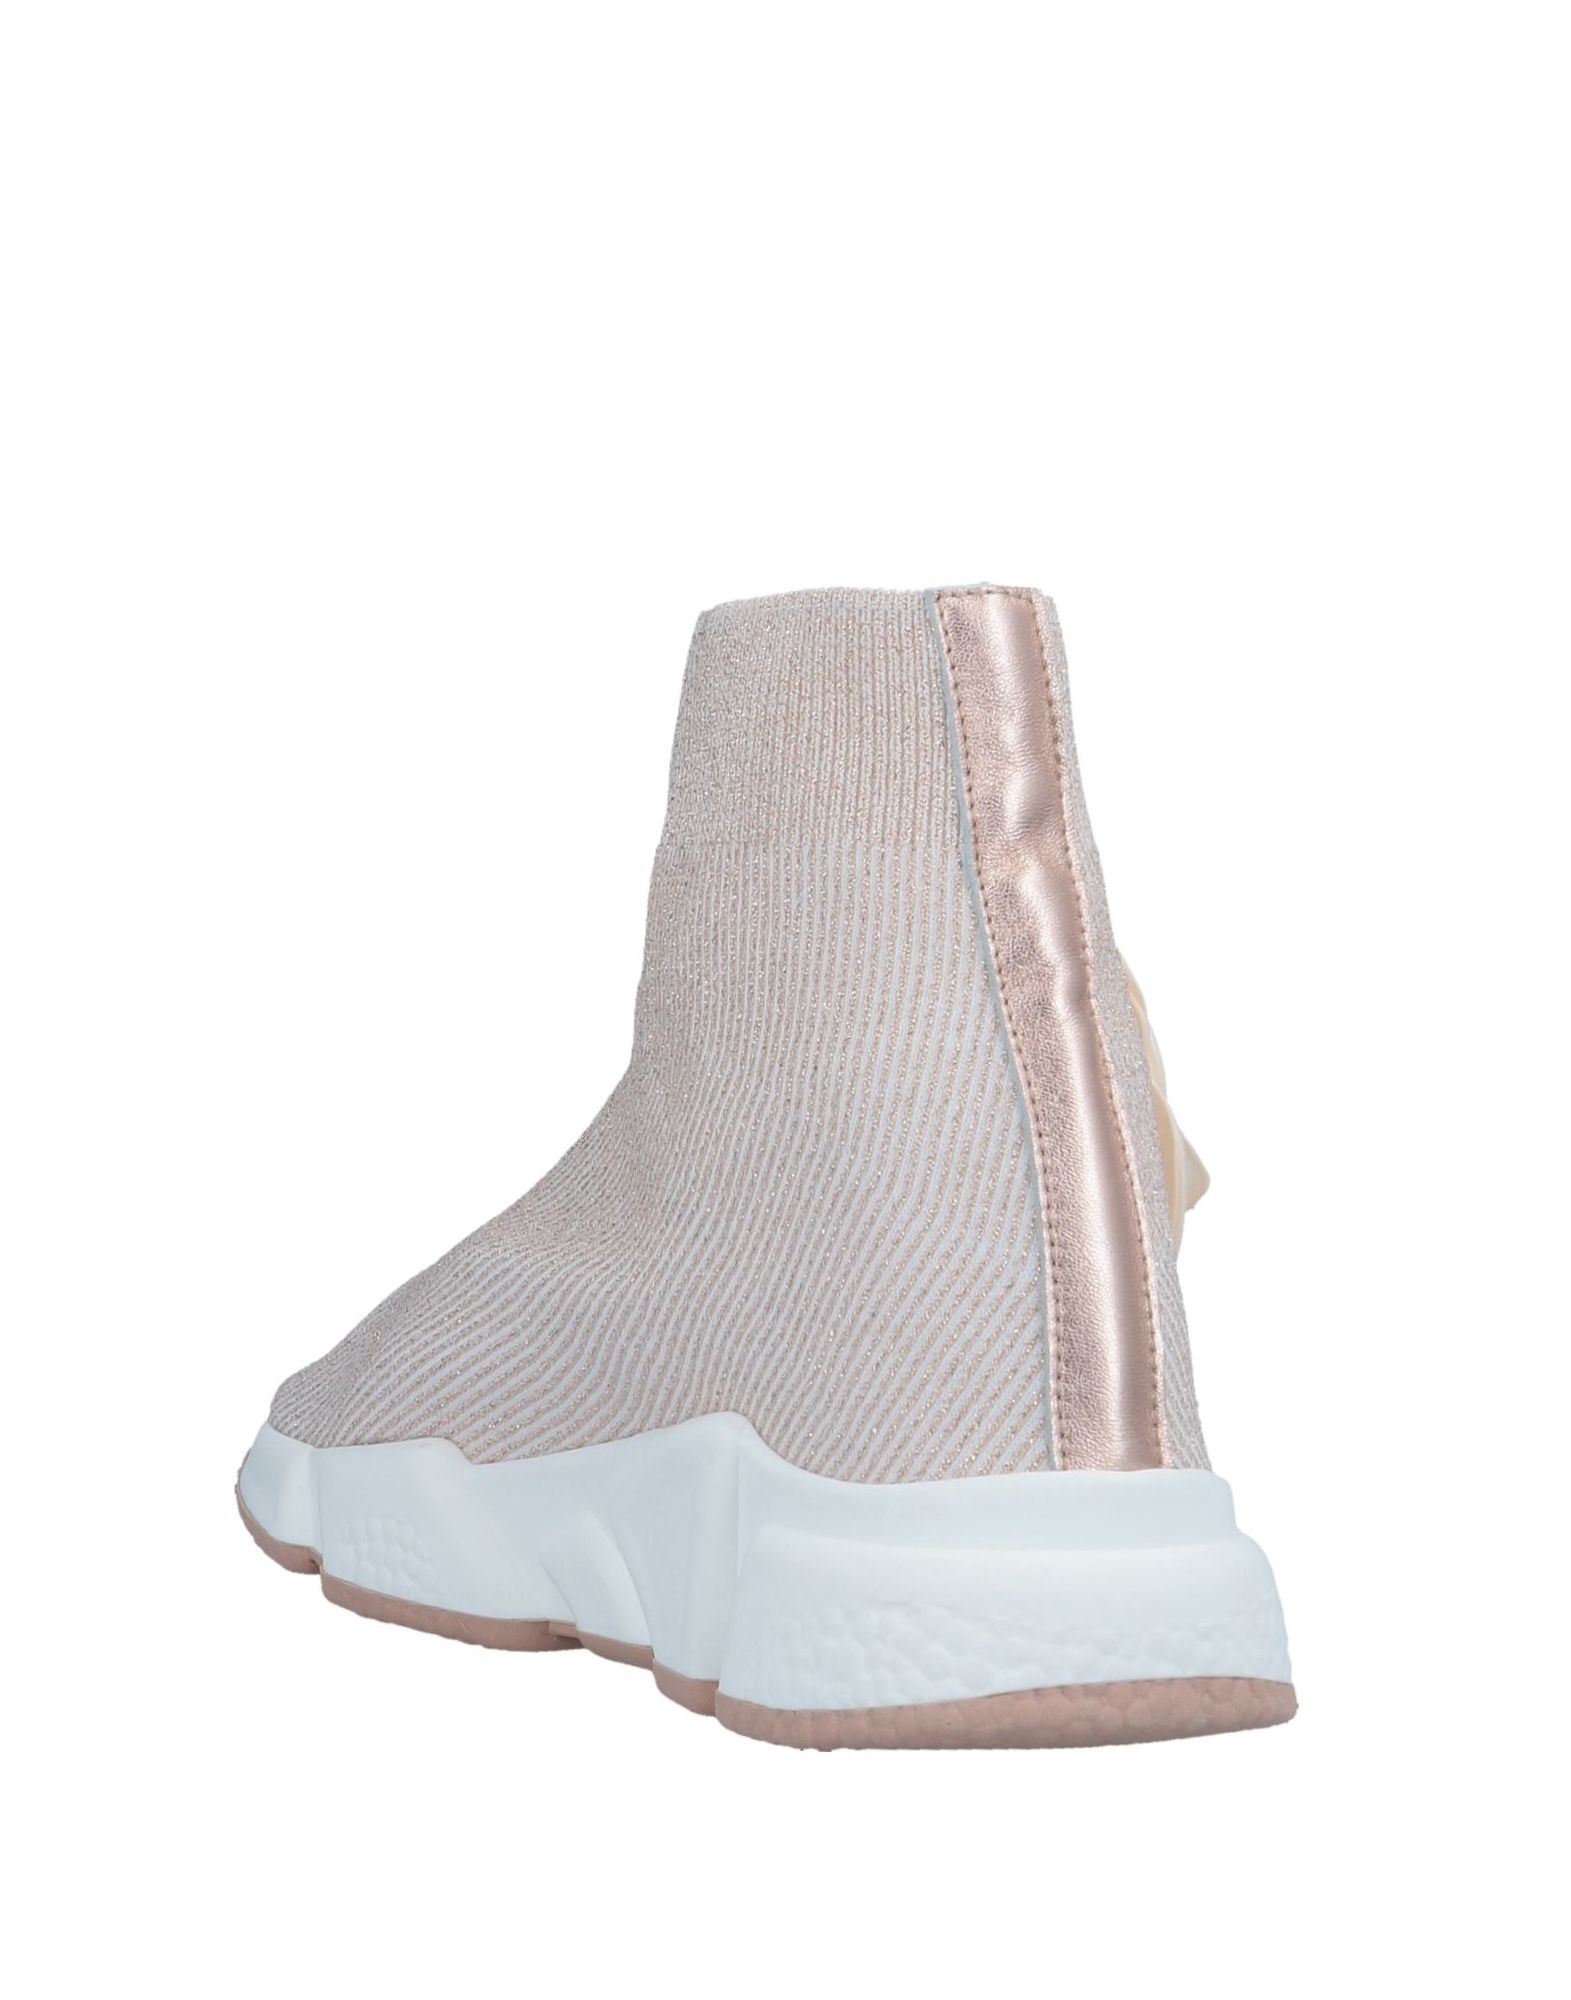 Nila & es Nila Sneakers Damen Gutes Preis-Leistungs-Verhältnis, es & lohnt sich 3799 47a24d